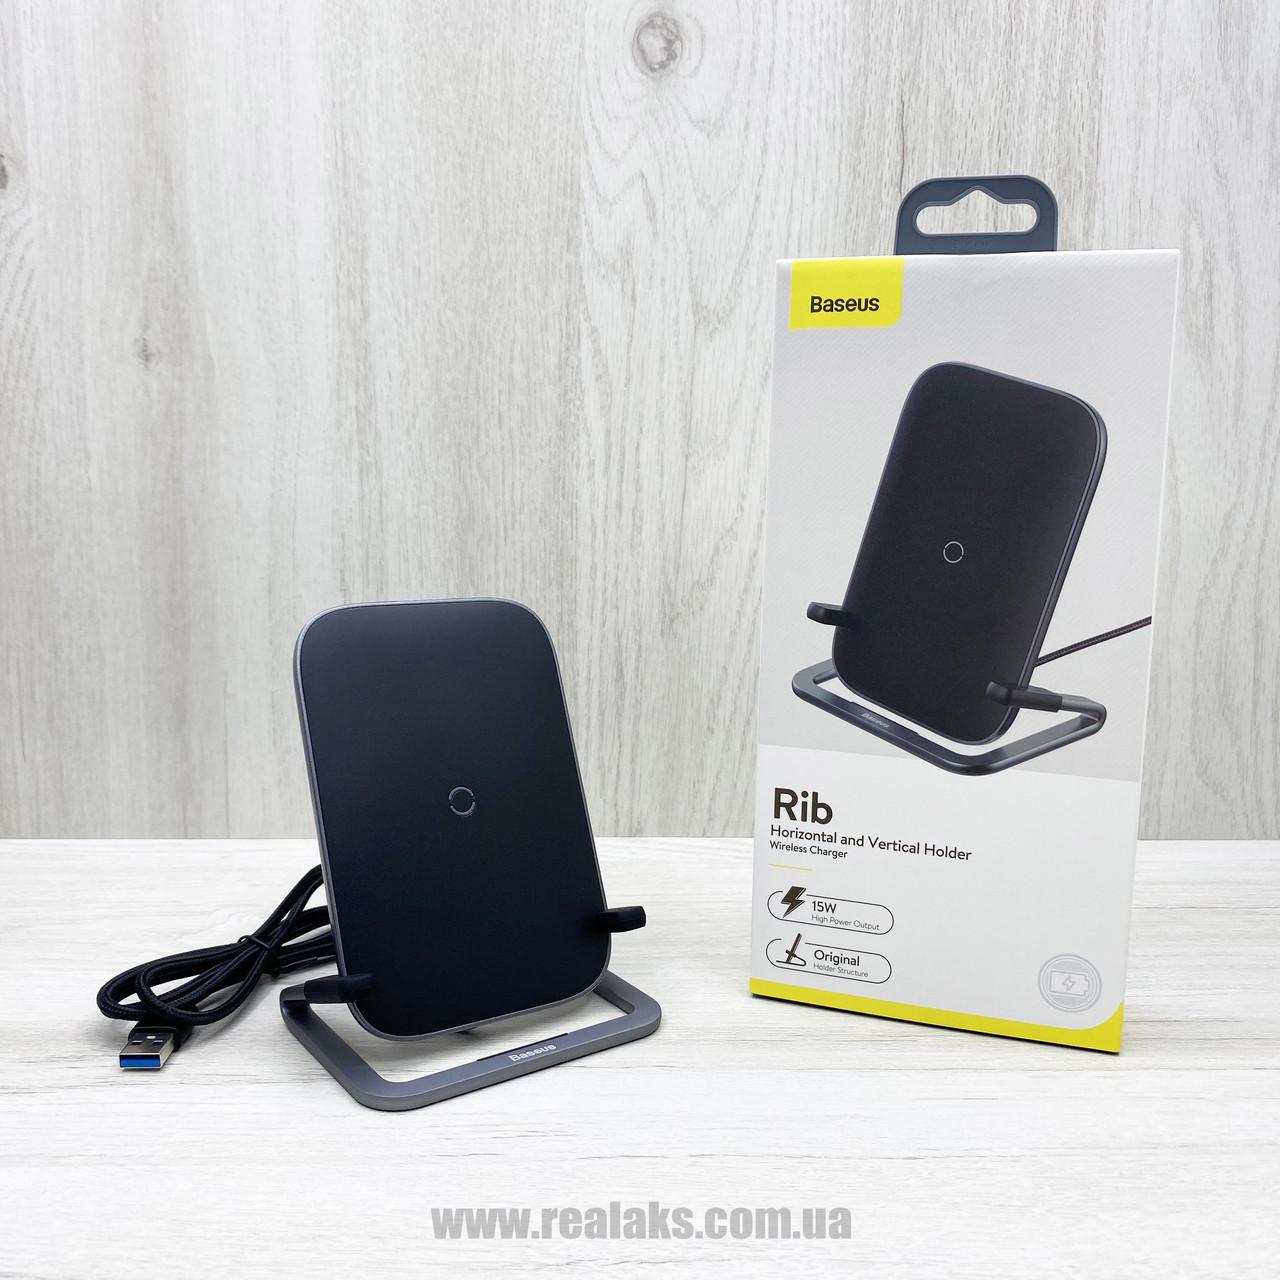 Беспроводная зарядка Baseus Rib Wireless Charging 15W (чёрная)